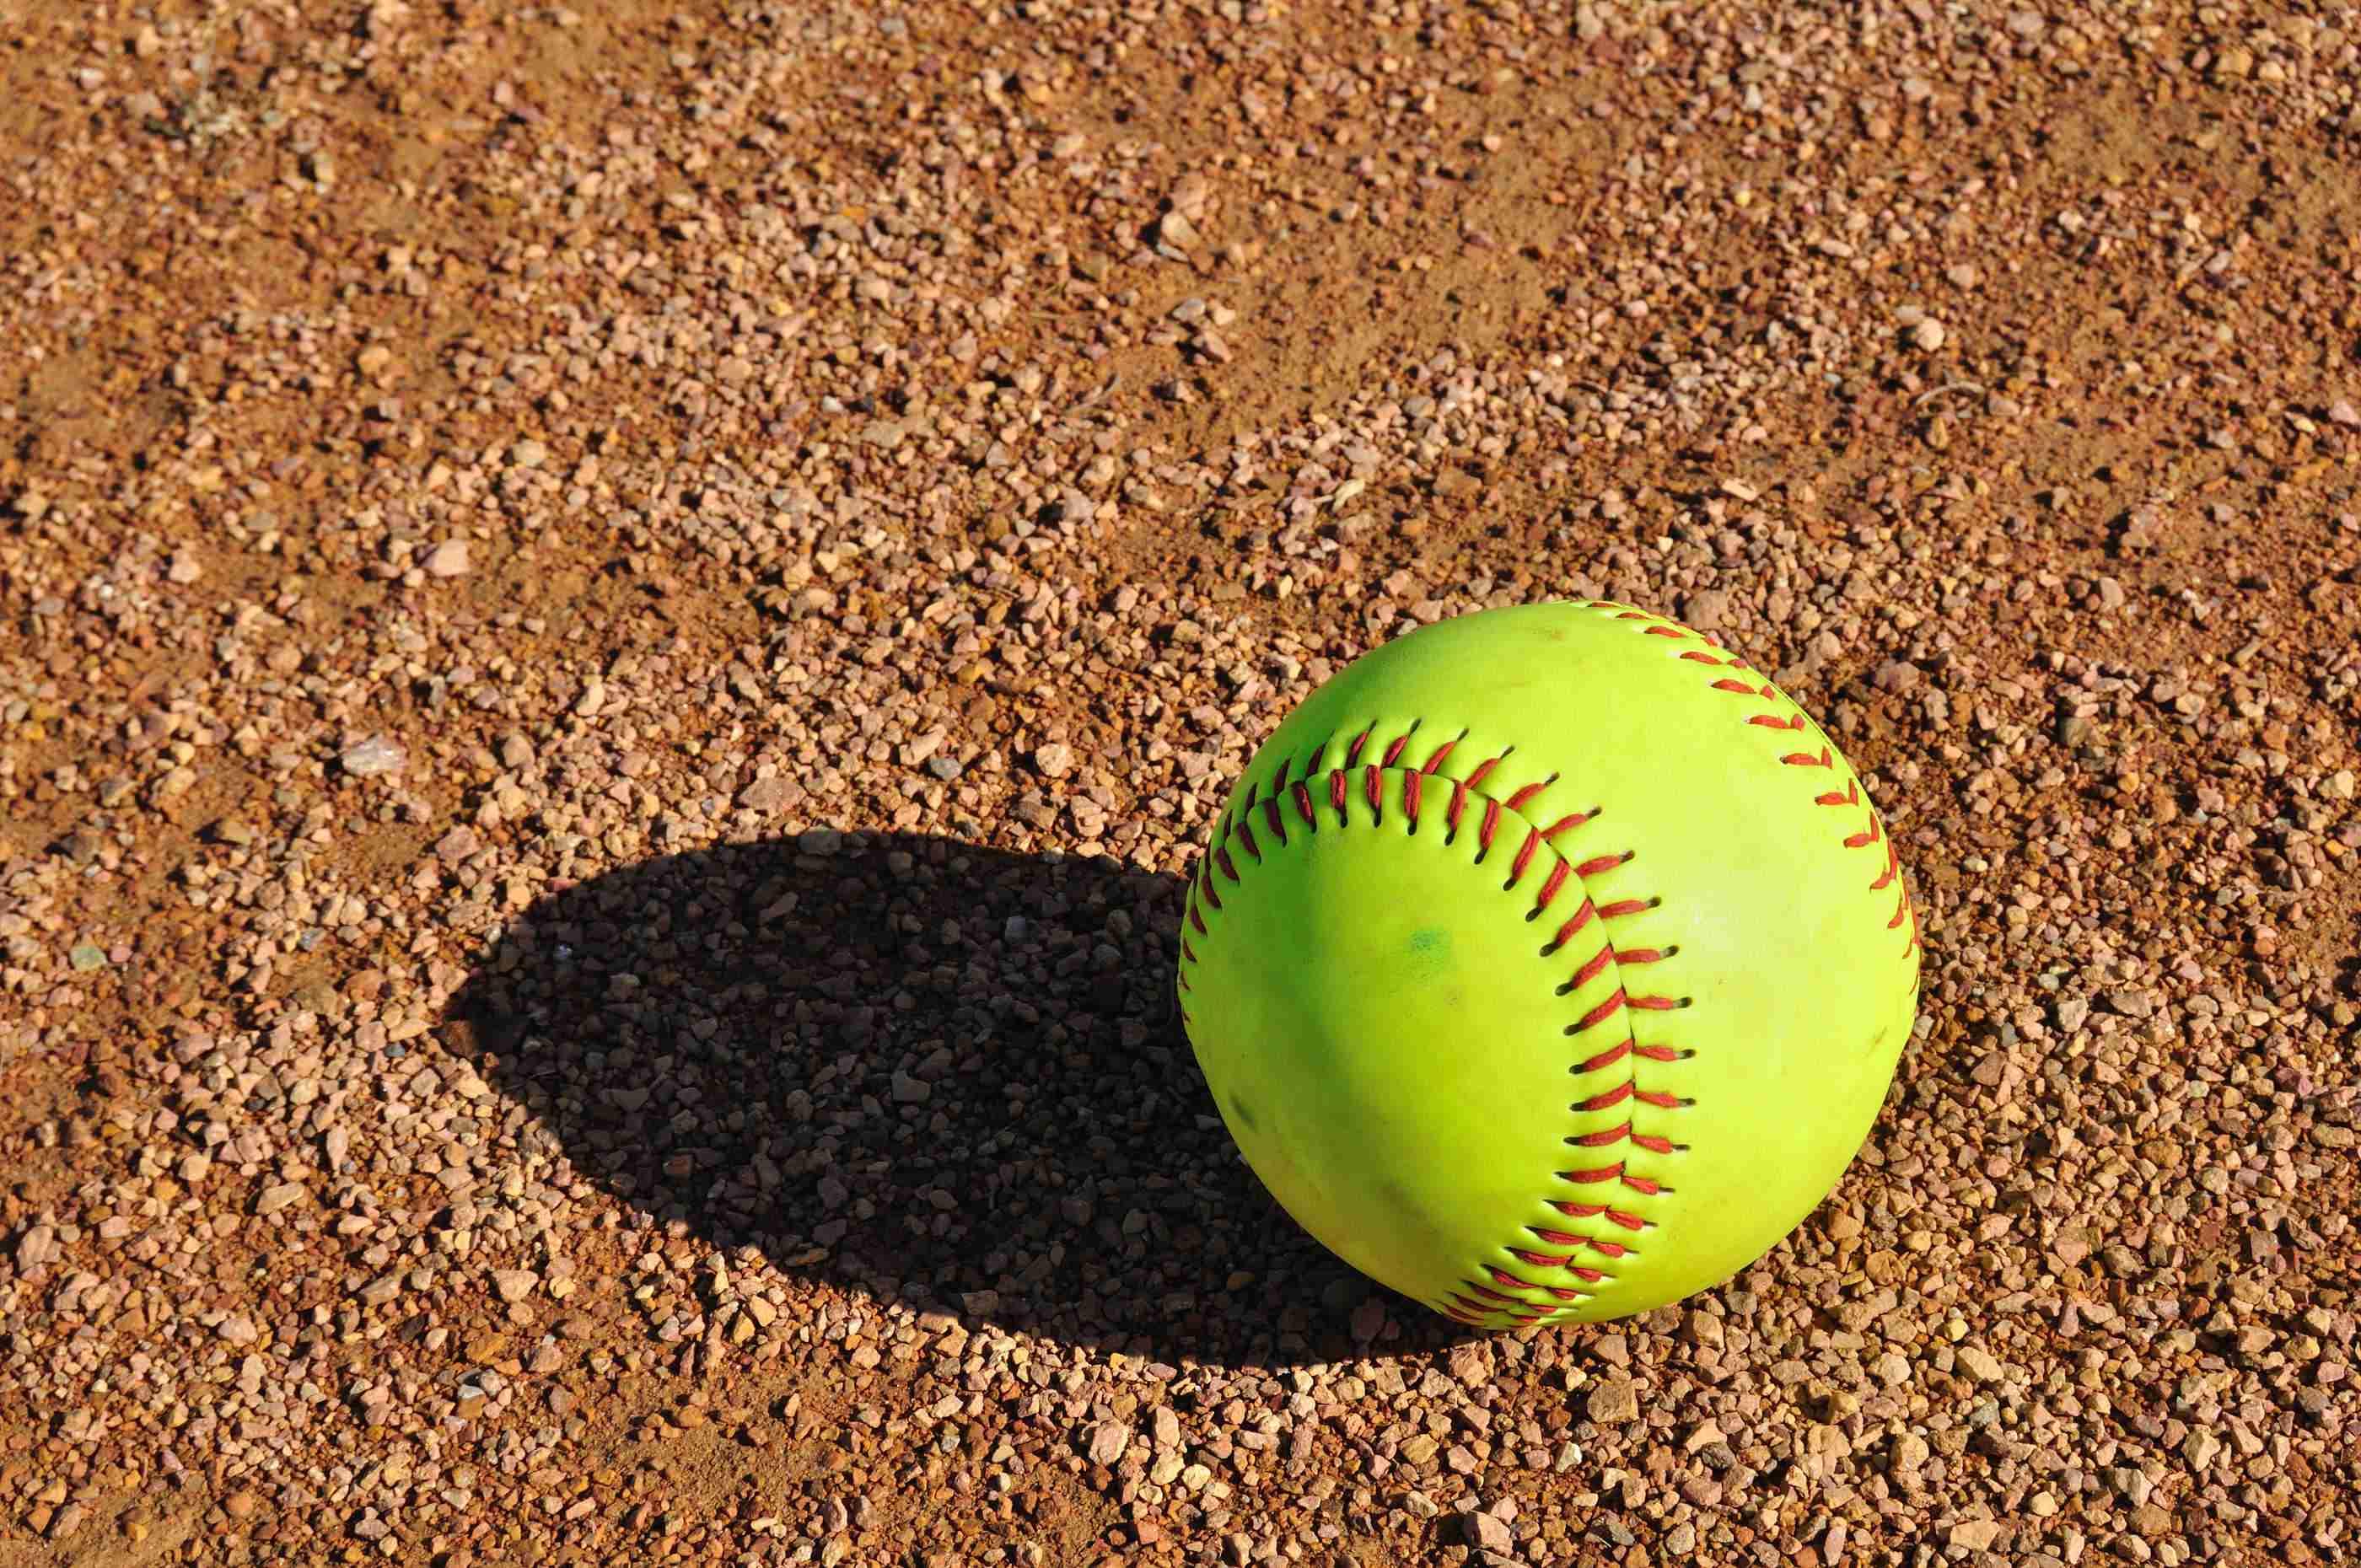 Yellow Softball Sitting on the Infield Dirt